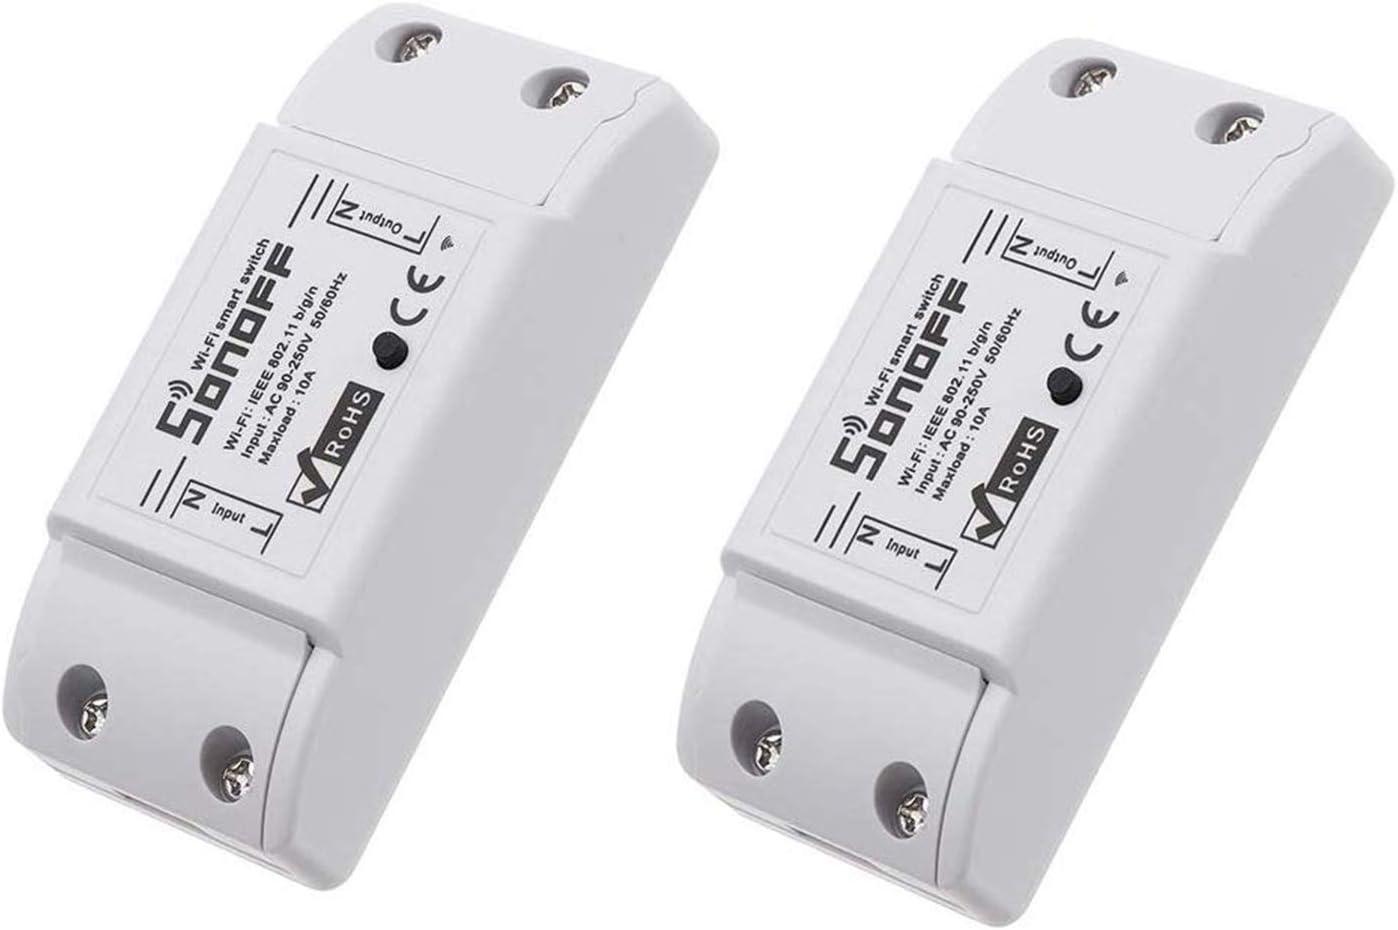 Blxecky Sonoff Interruptor inteligente WiFi con mando a distancia, inalámbrico, temporizador inteligente, control a través de Amazon Echo Alexa, Android IOS App